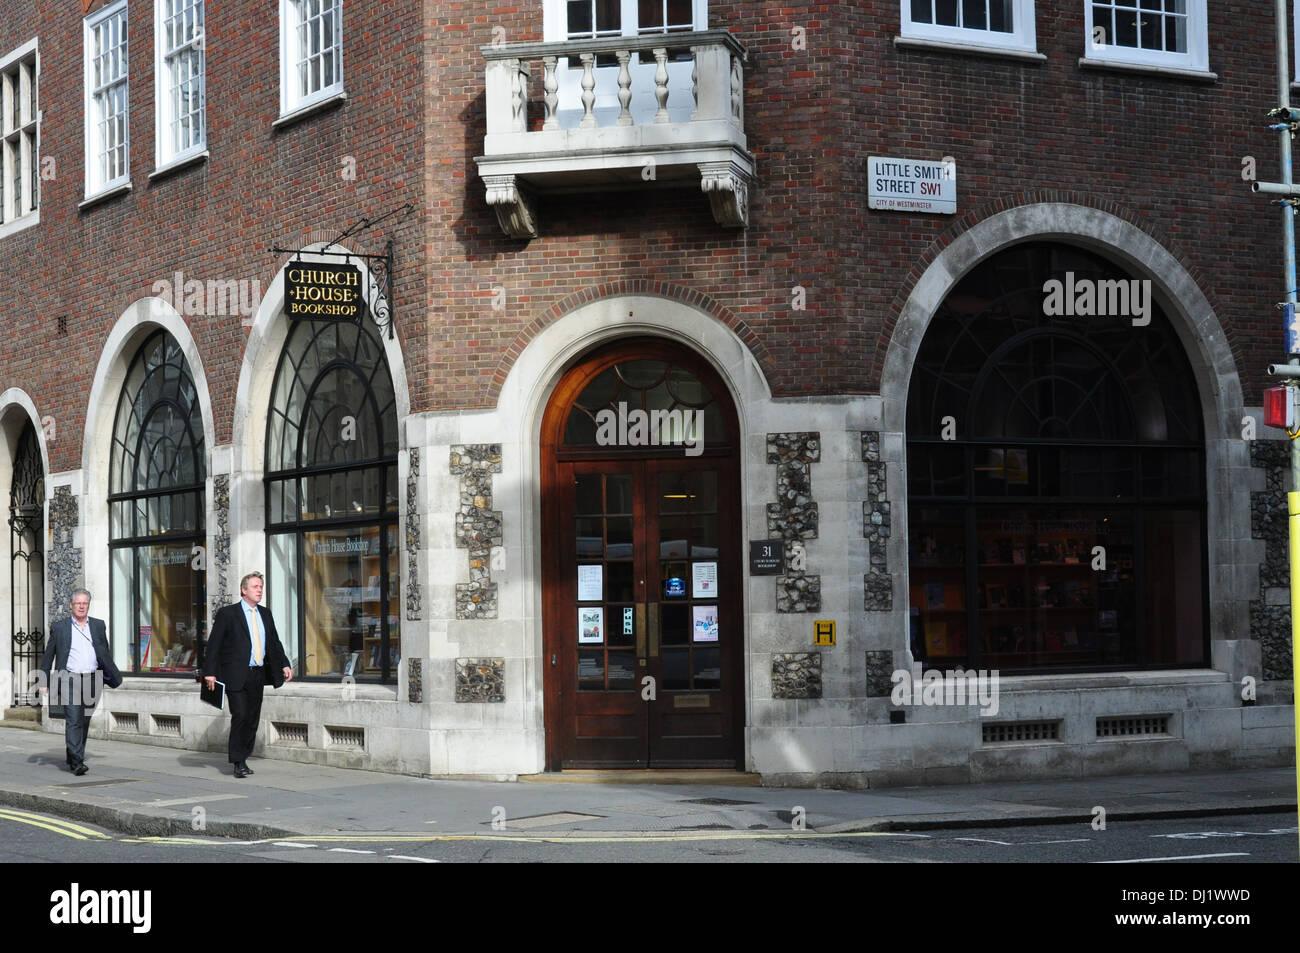 KIRCHE HOUSEBOOK SHOP GT SMITH STREET LONDON UK Stockbild